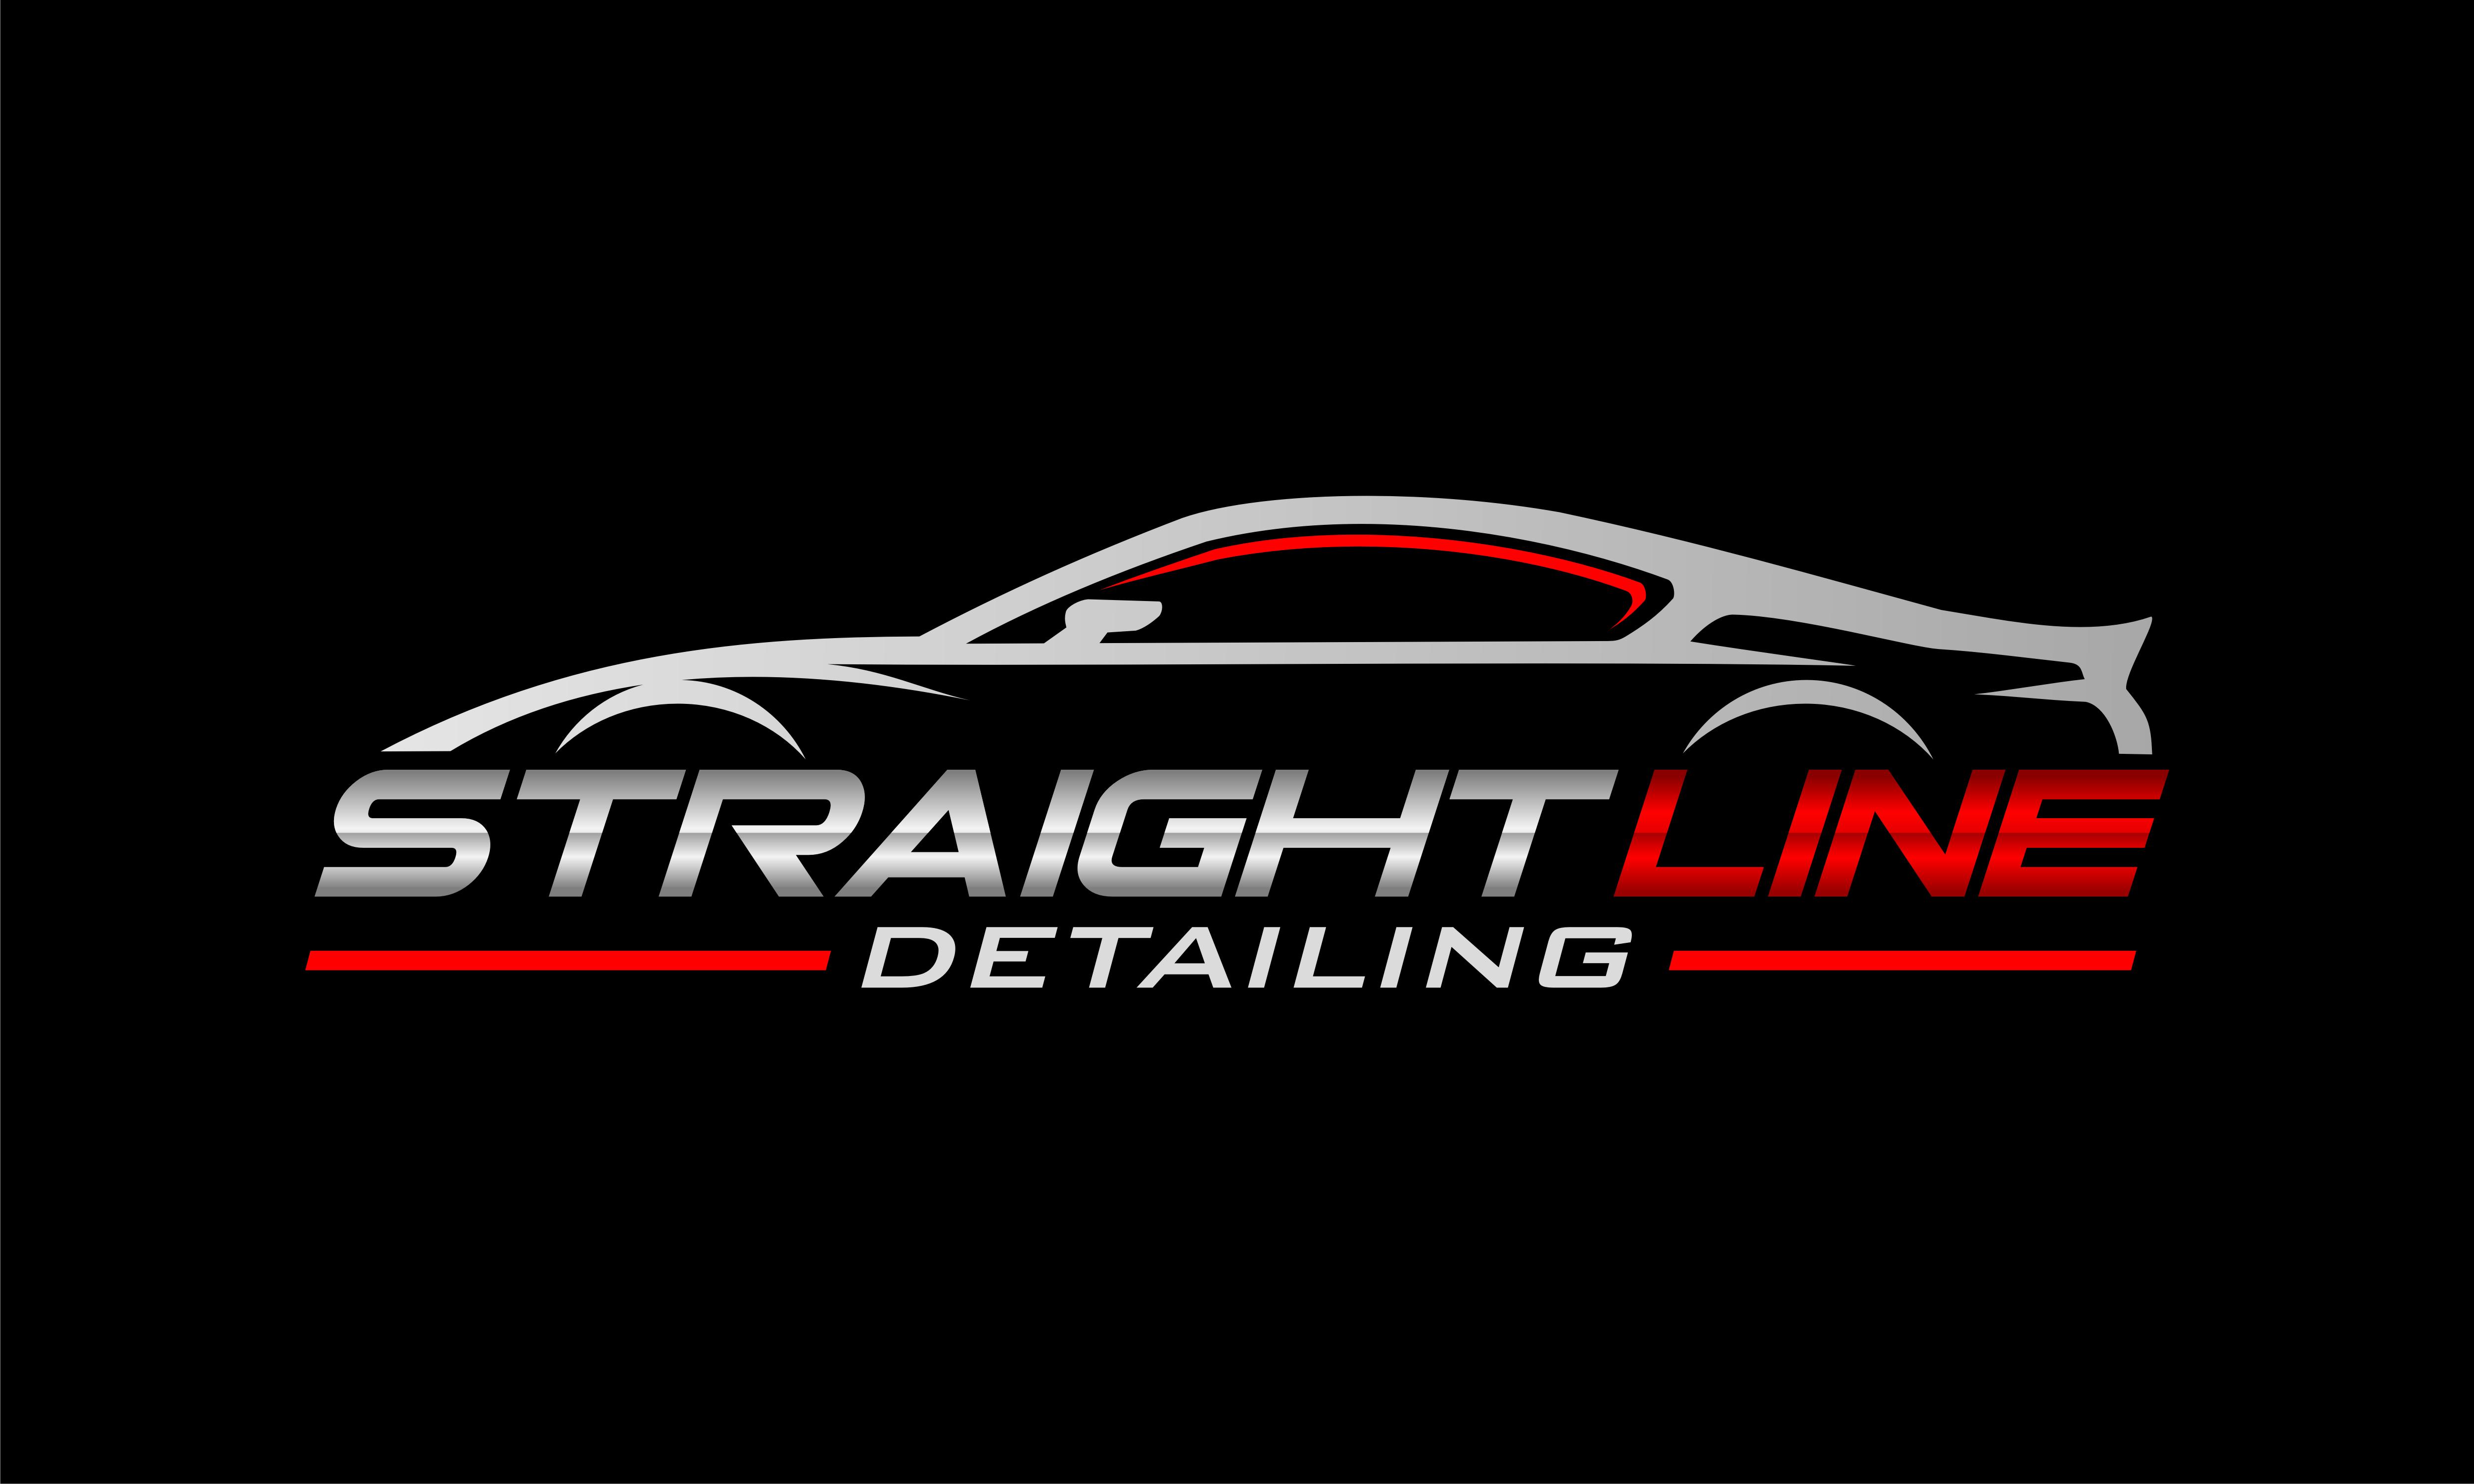 Straightline automotive detailing